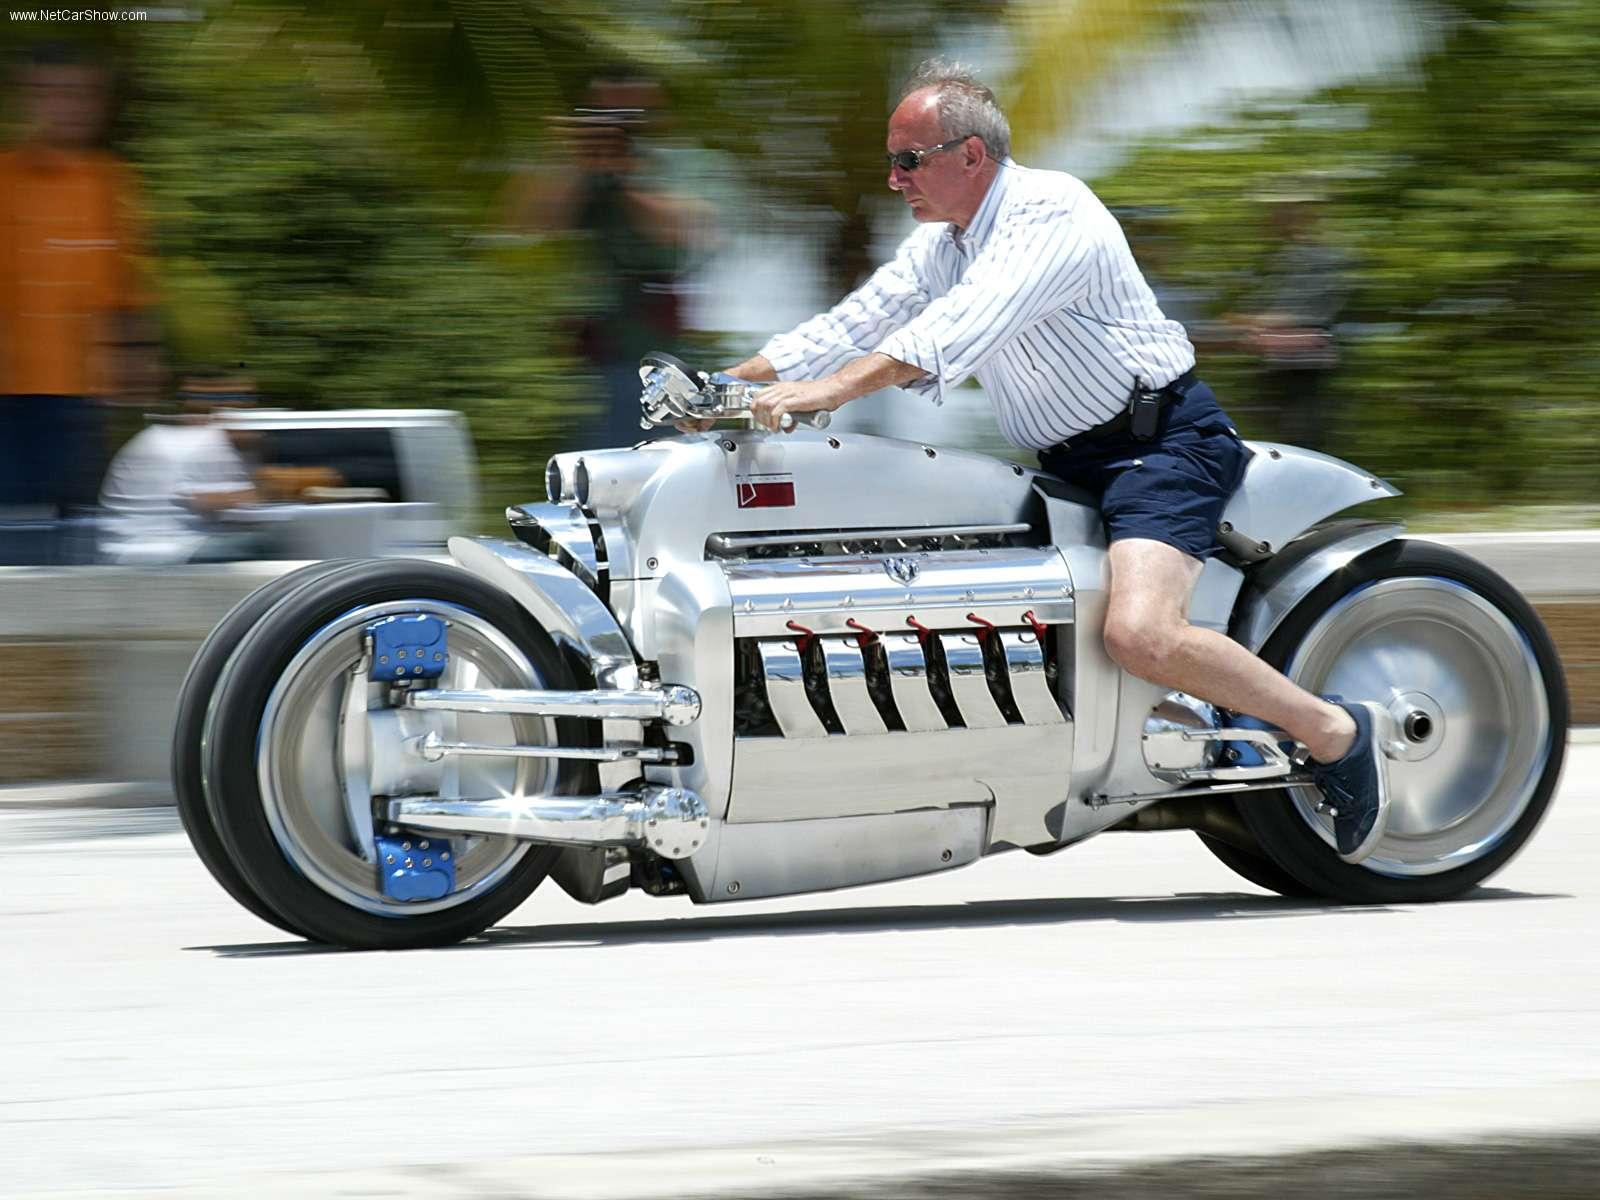 Мотоцикл Dodge Tomahawk от Chrysler.